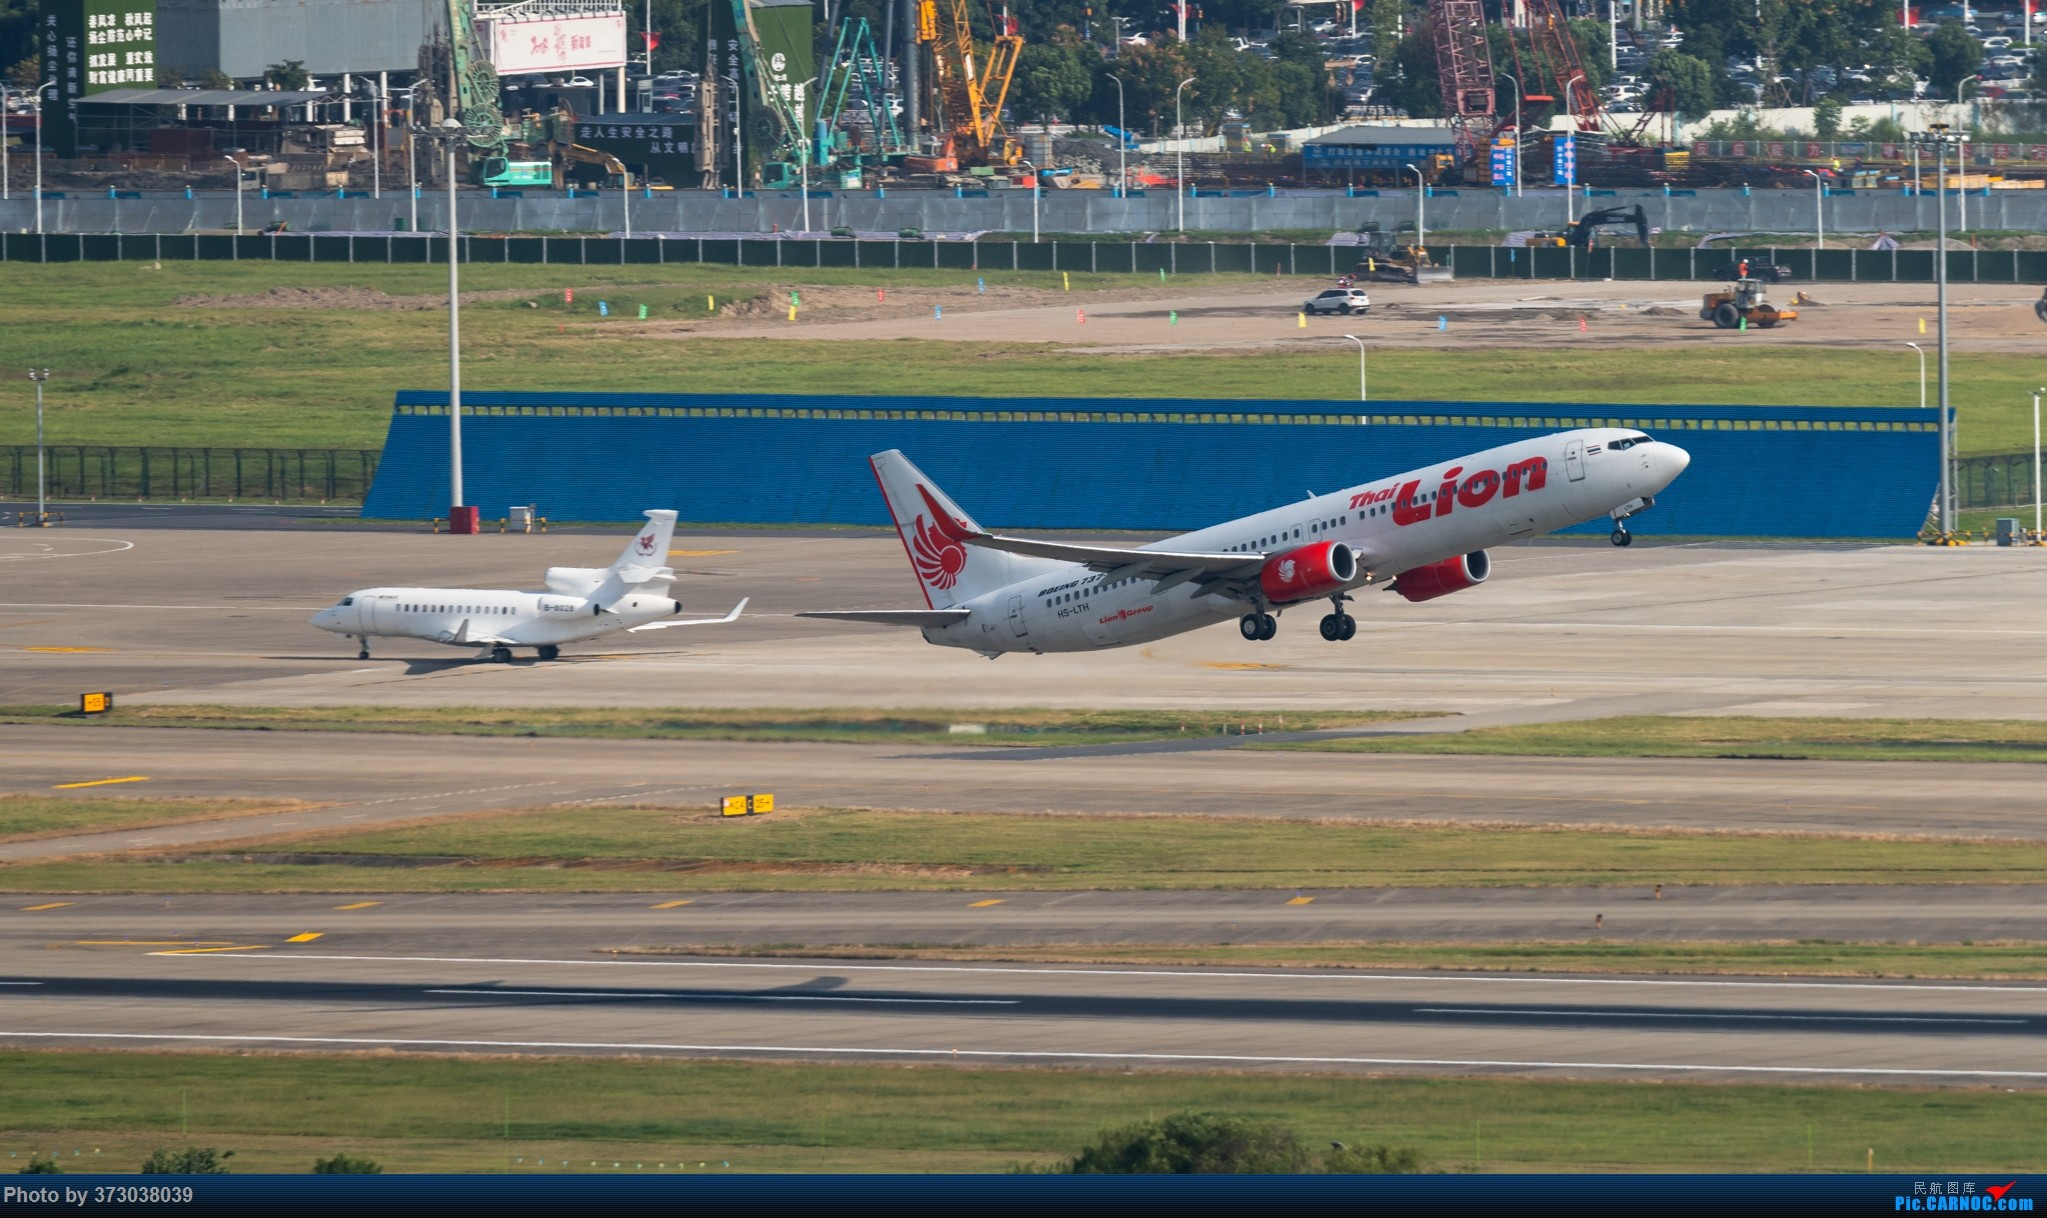 Re:[原创]山顶动人,杭州萧山国际机场 红山观光视角 BOEING 737-900ER HS-LTH 中国杭州萧山国际机场